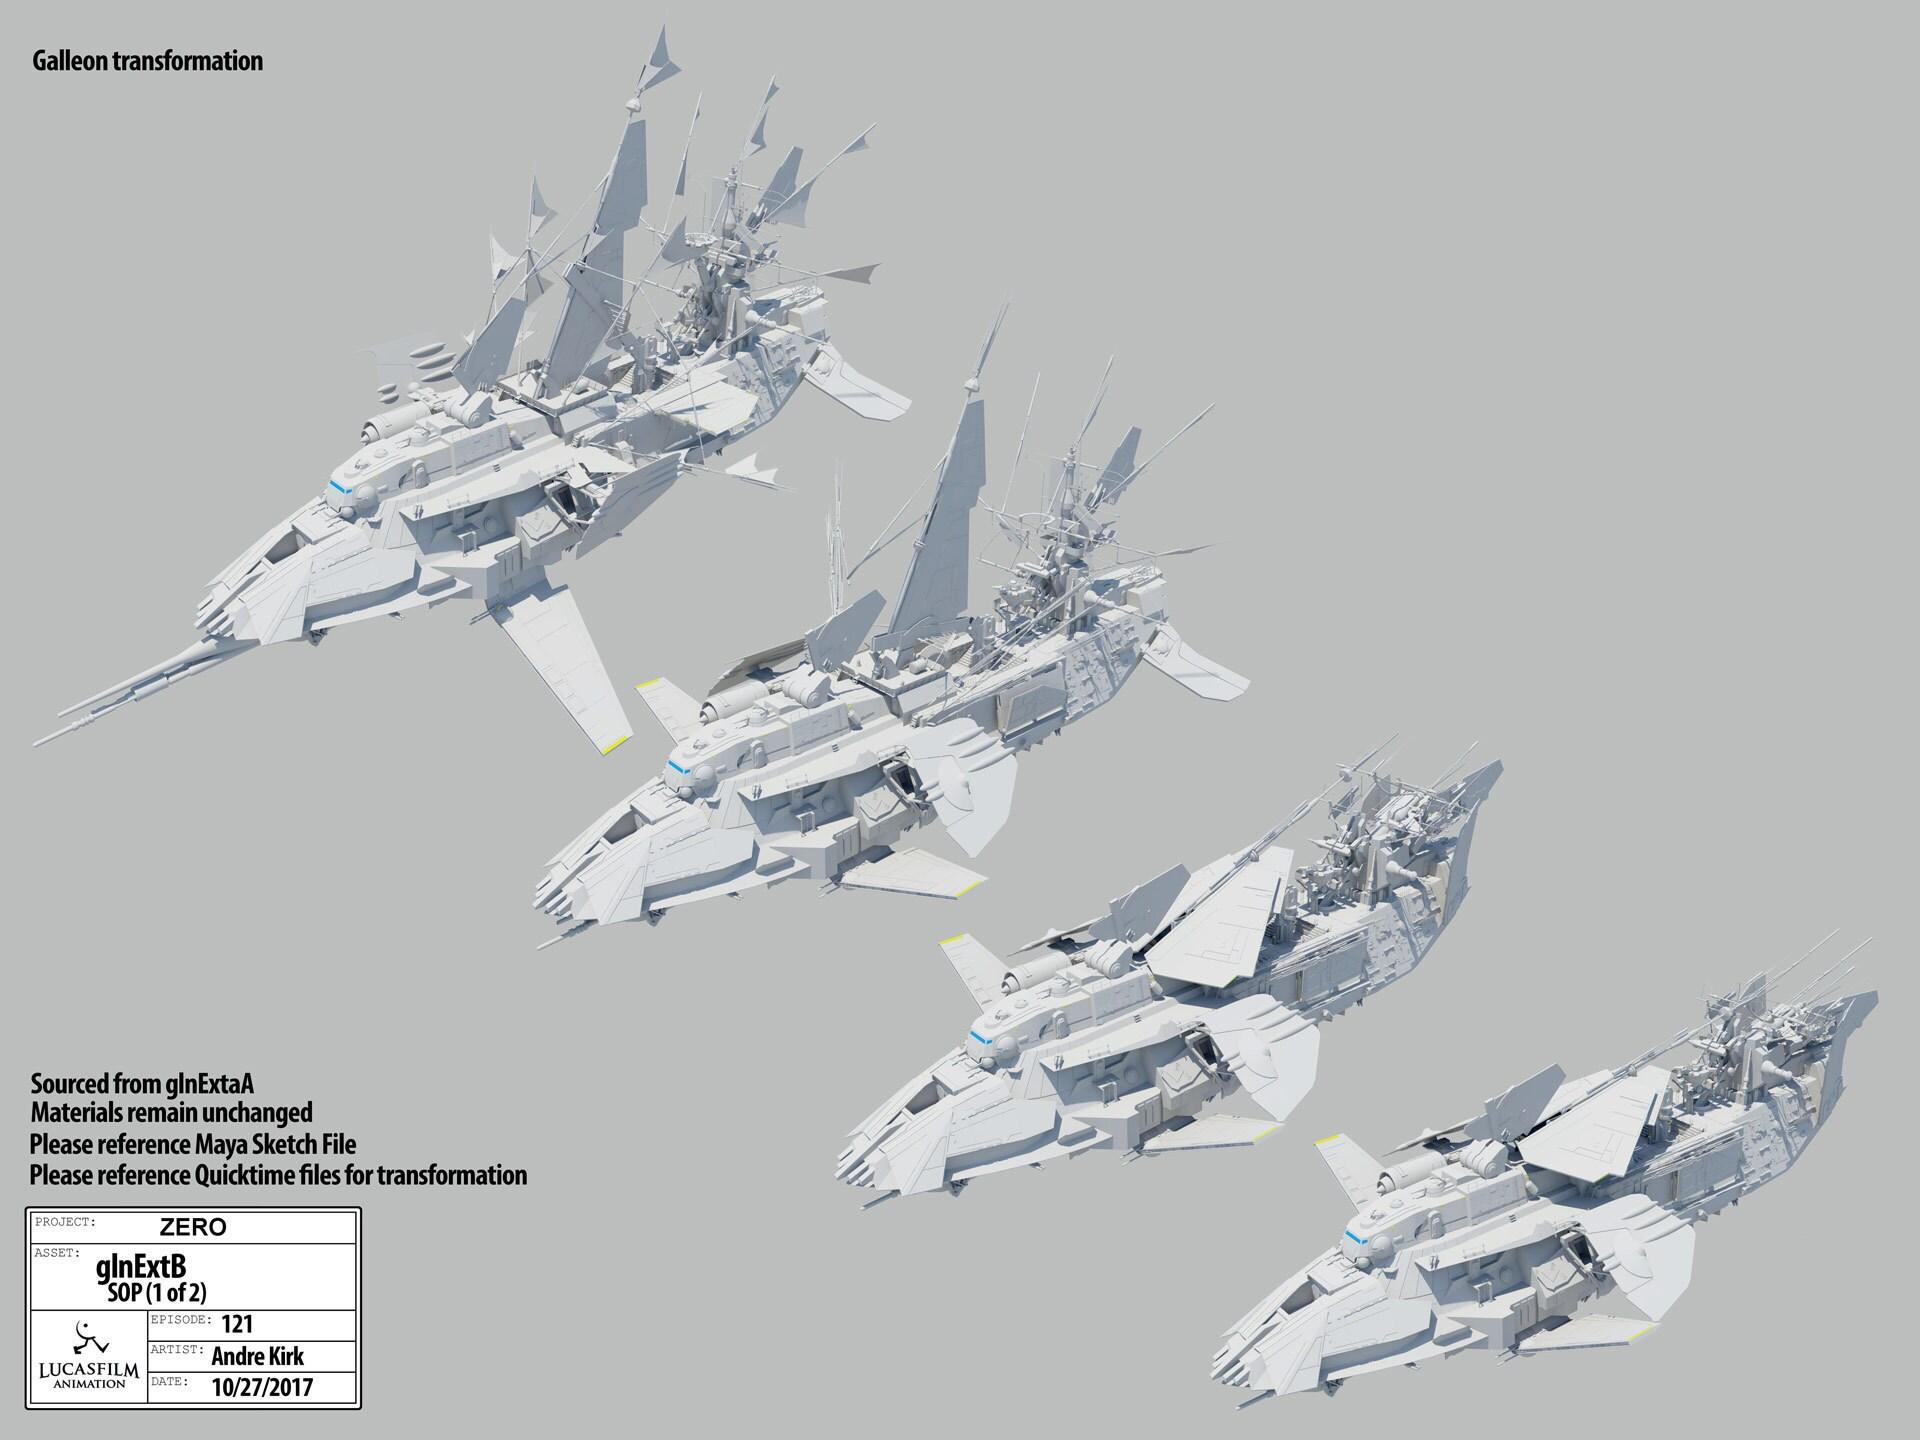 resistance-121-concept-art-gallery-6_9bedac26.jpeg?region=0%2C0%2C1920%2C1440